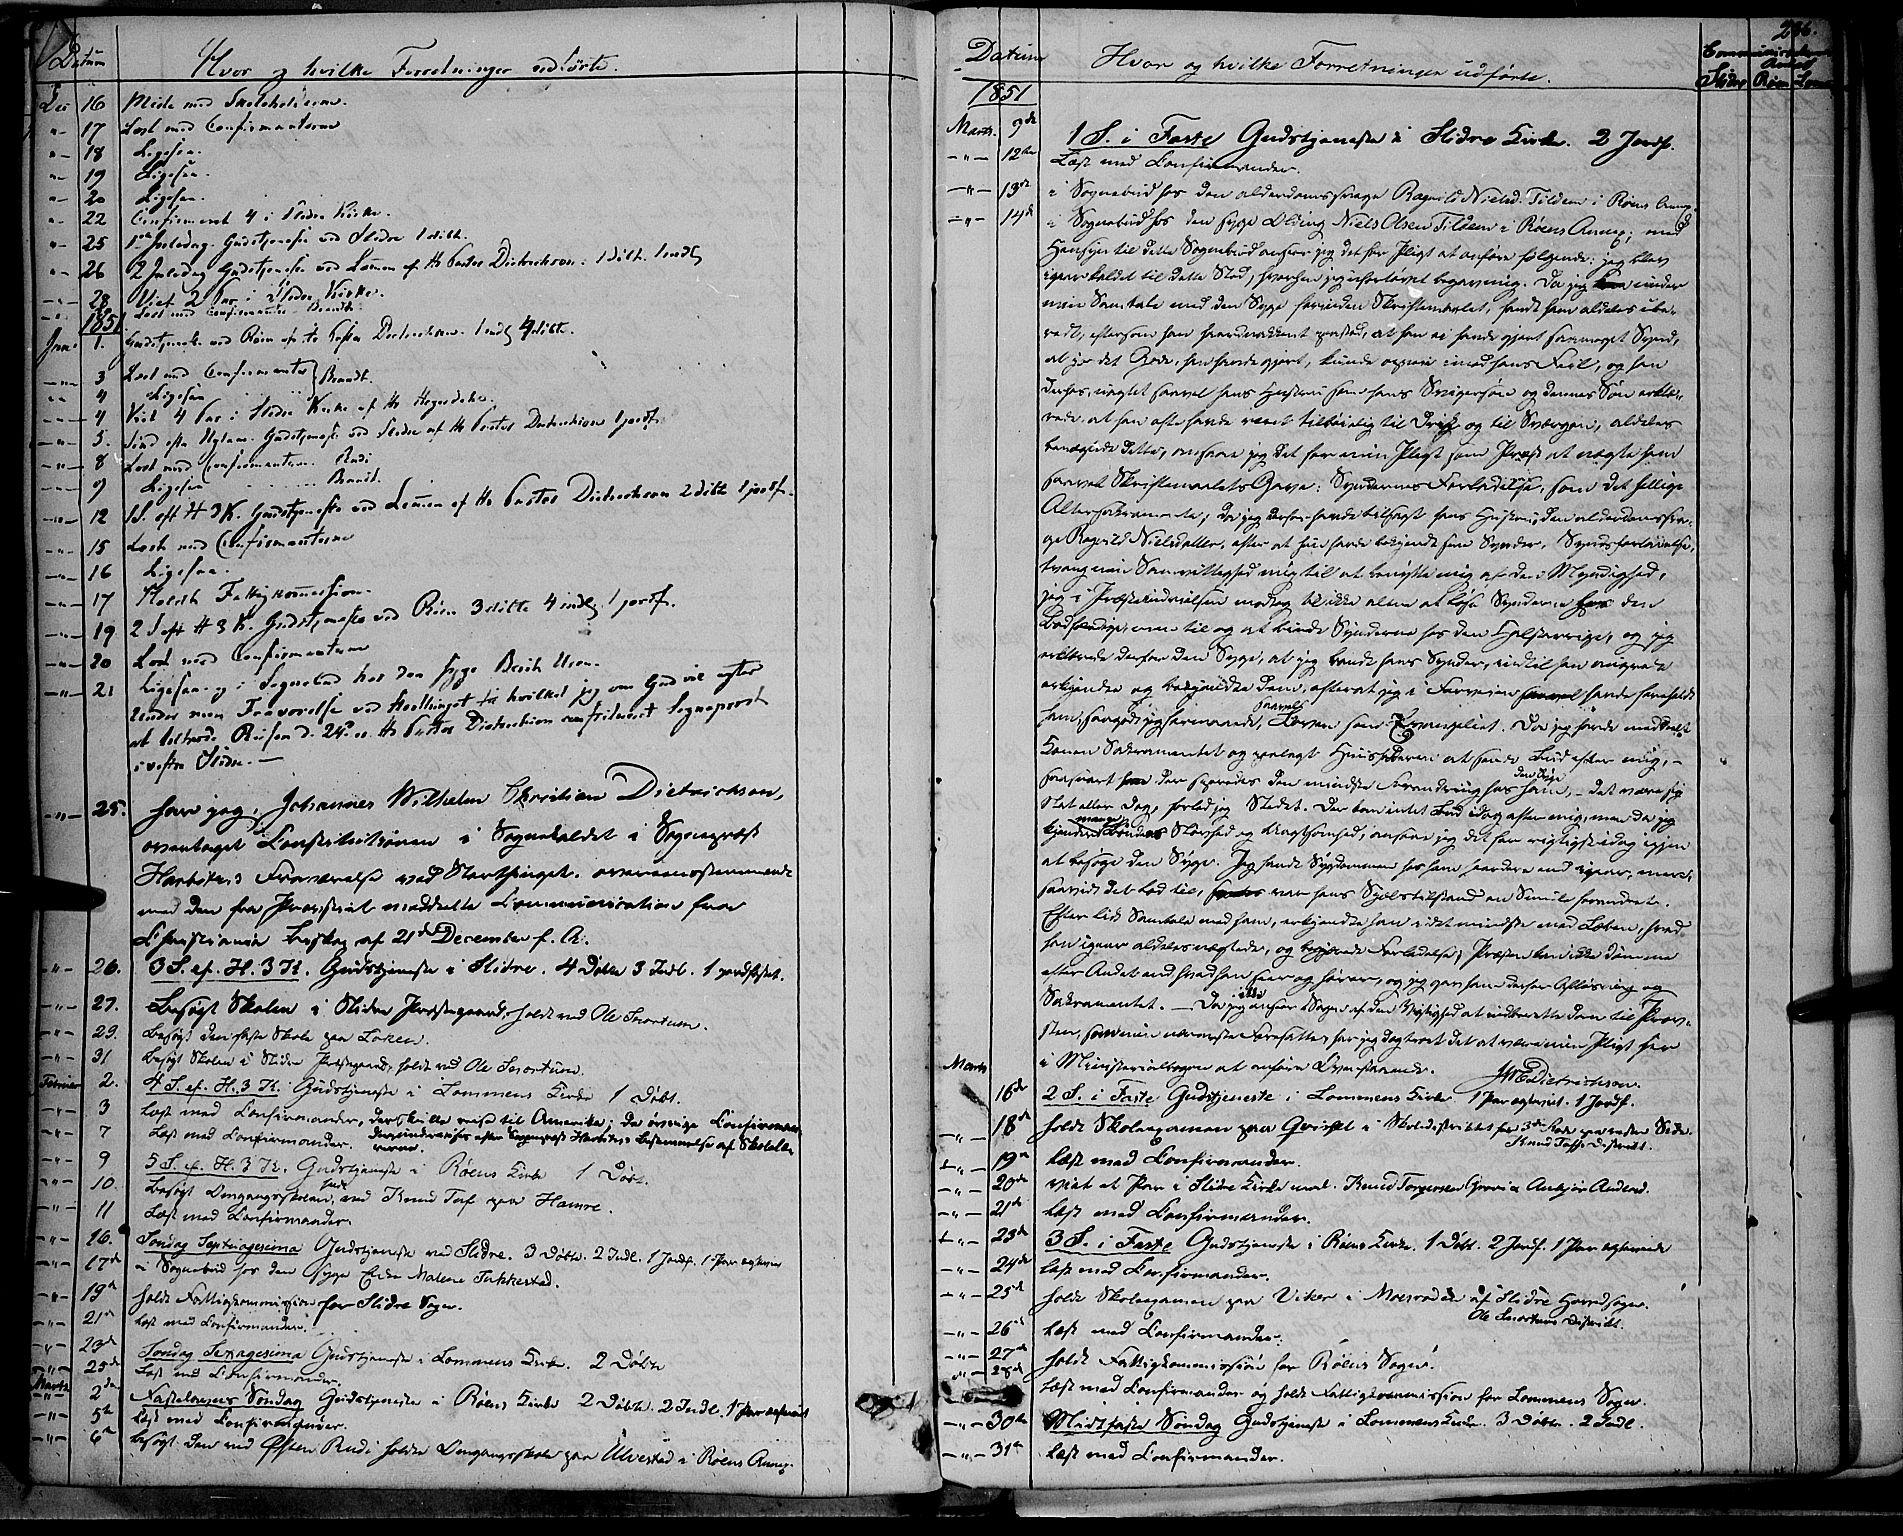 SAH, Vestre Slidre prestekontor, Ministerialbok nr. 1, 1844-1855, s. 286